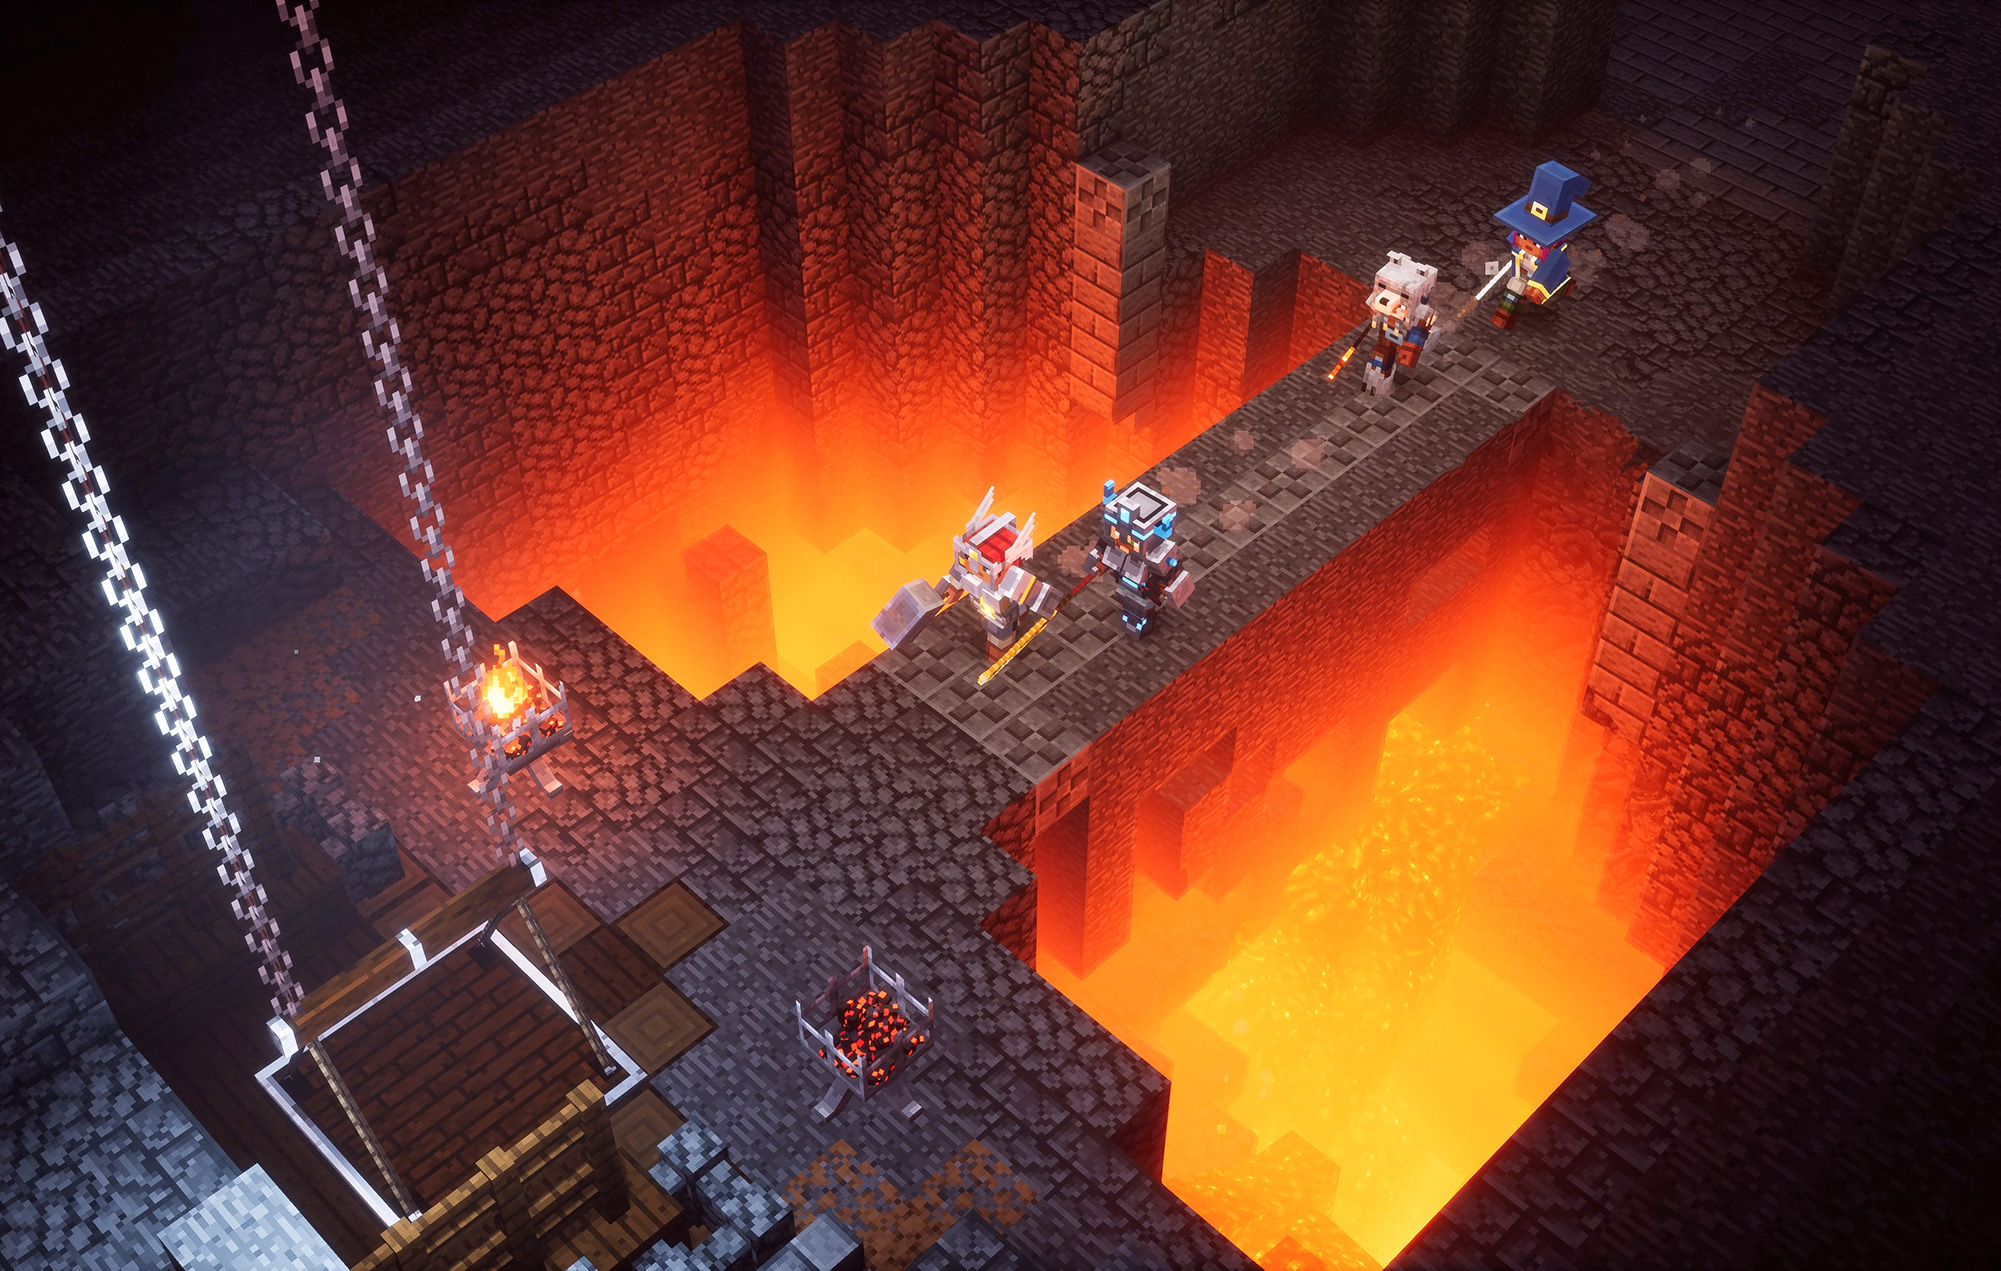 Minecraft Dungeons dethrones Animal Crossing as the eShop's top seller screenshot